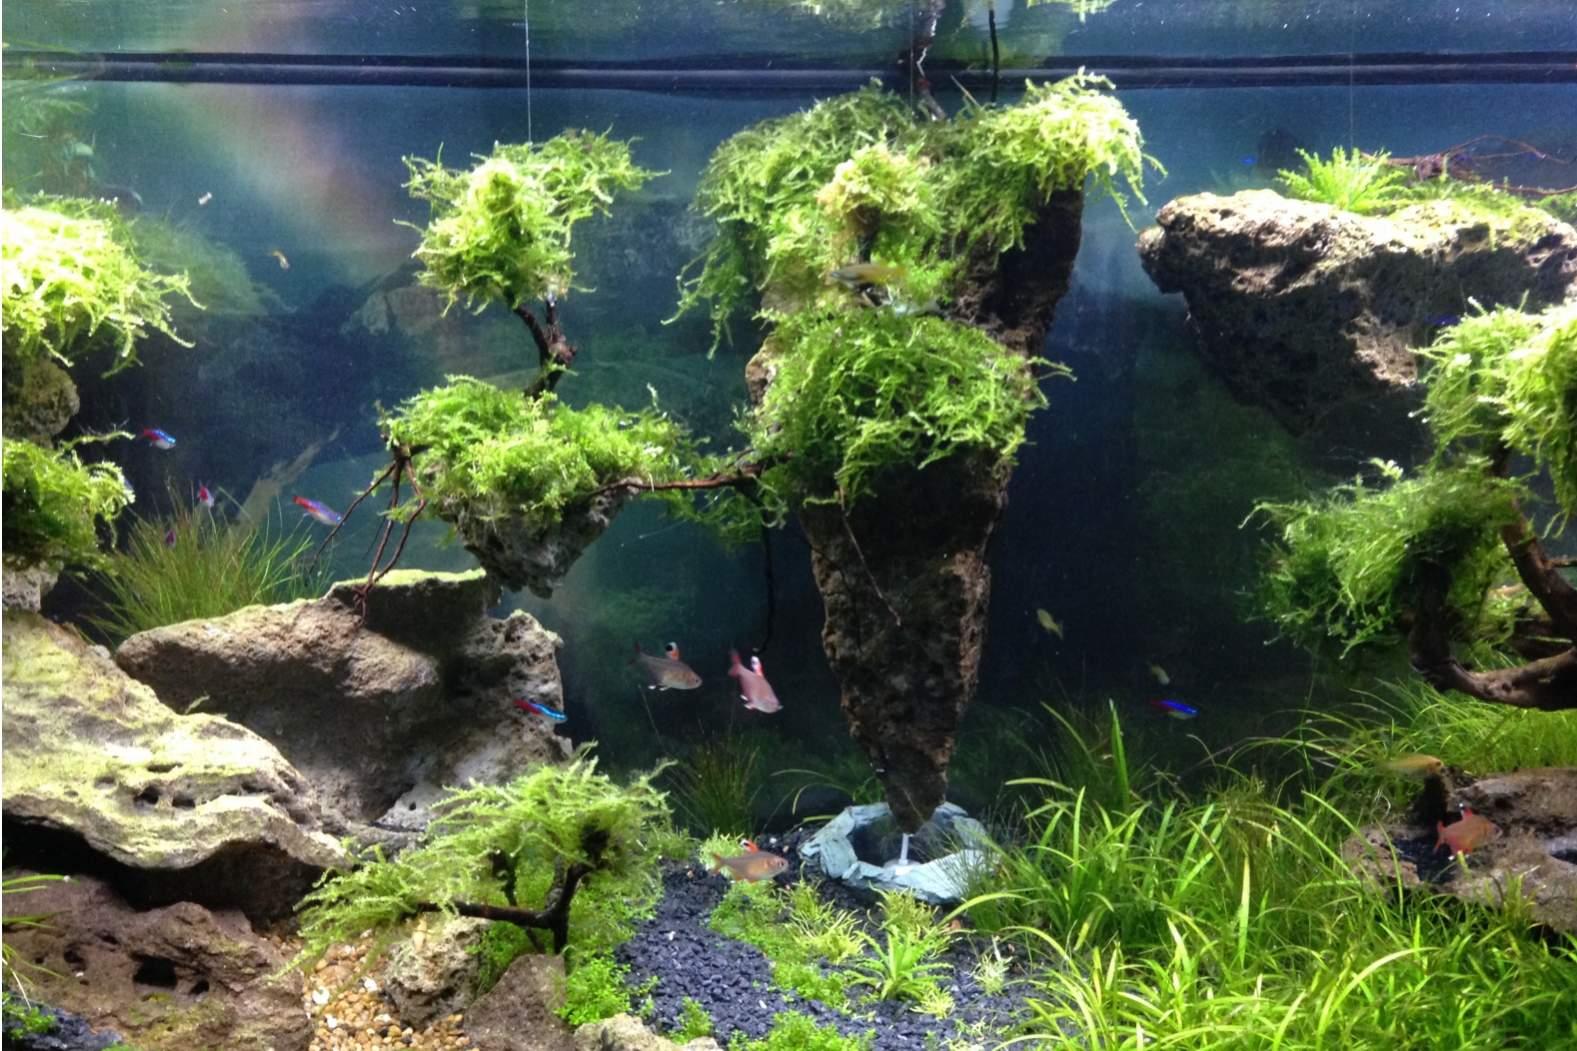 Aquascape Floating Island Pesona Alam Dalam Ruang Part 2 Halaman All Kompasiana Com